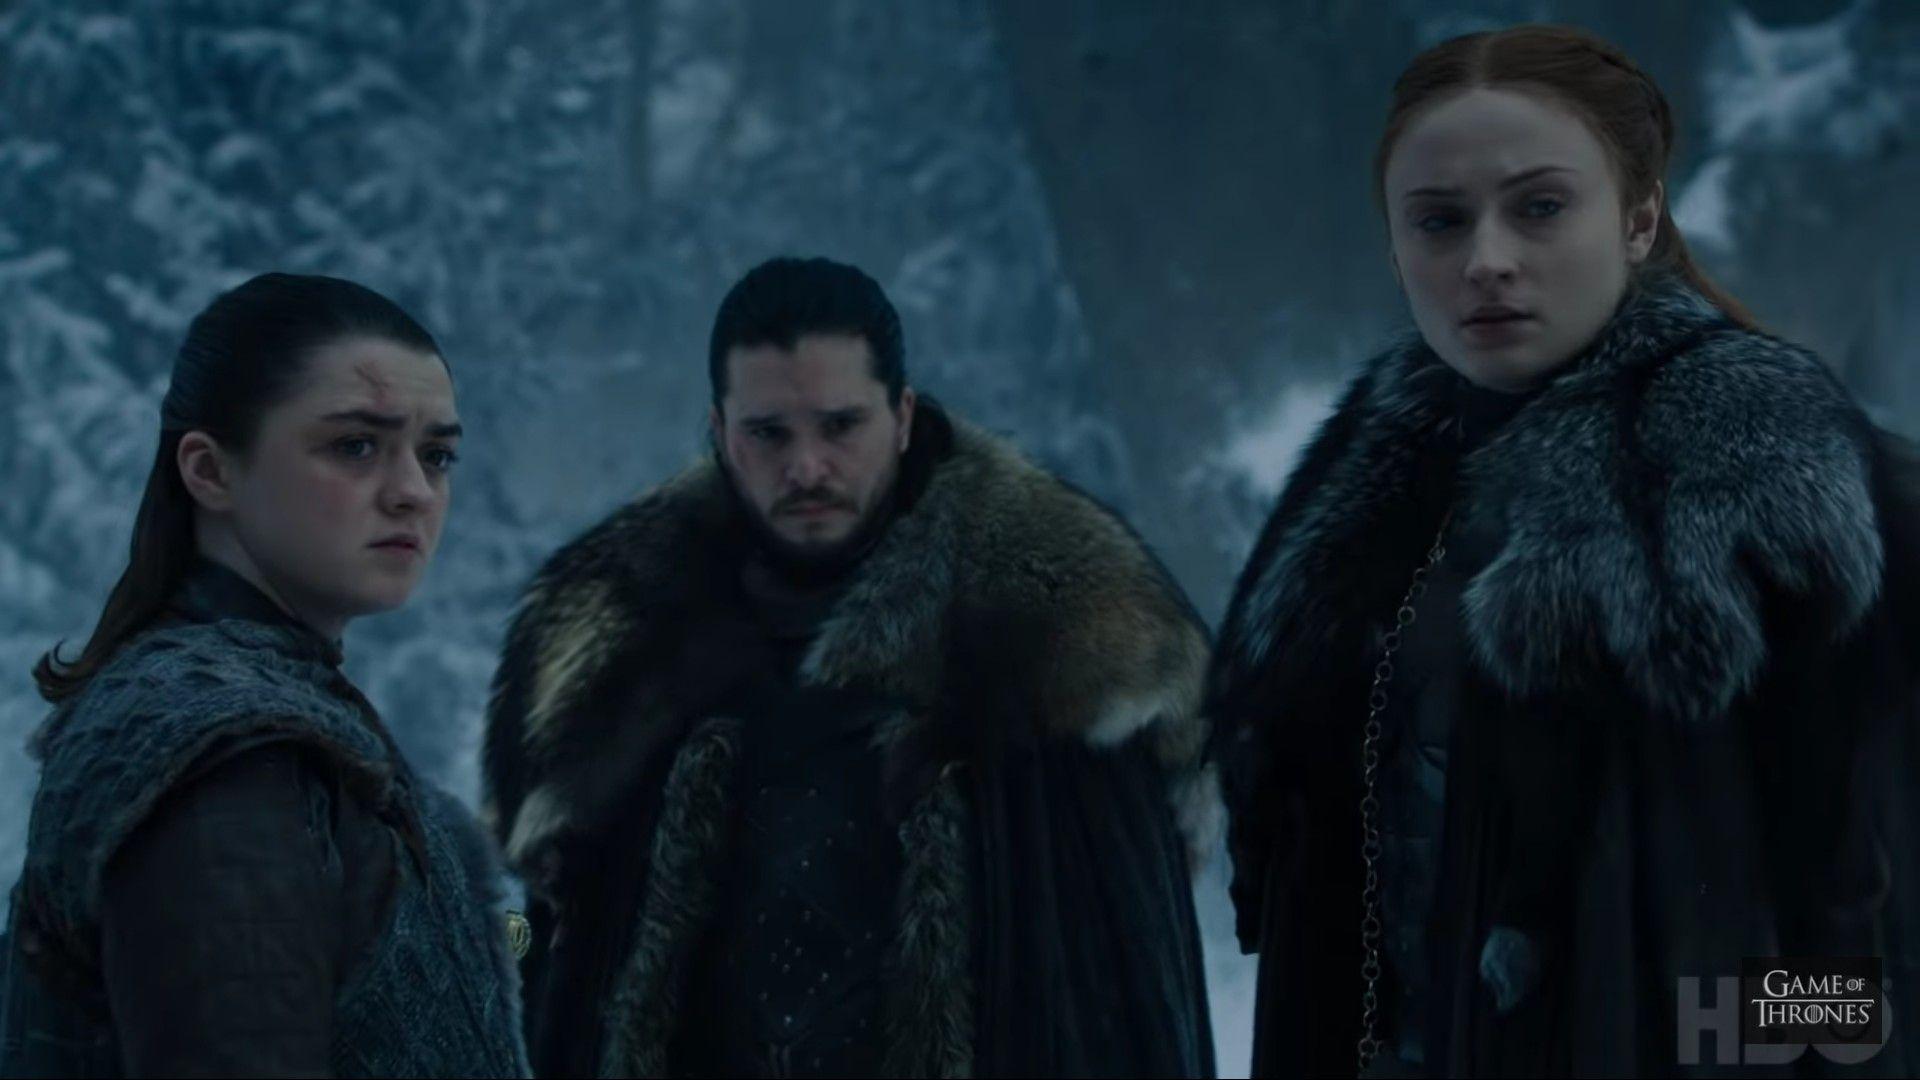 Jon Sansa Arya 8x4 The Last Of The Starks Sansa And Margaery Jon And Arya Arya And Sansa